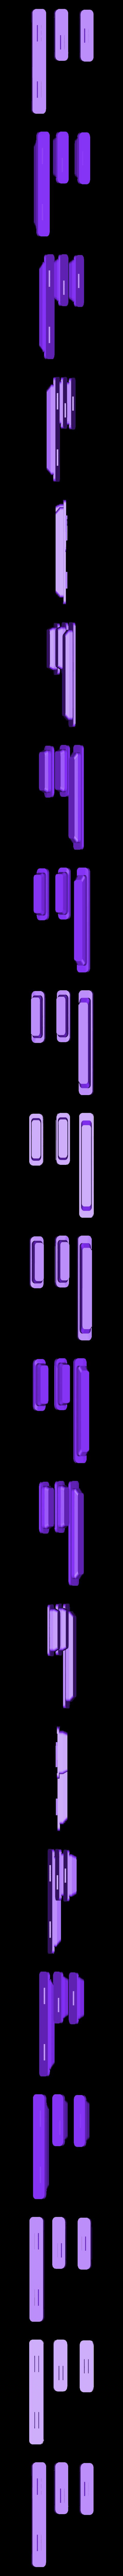 cova103_buttons.stl Download free STL file Fairphone 2 cover • 3D printer model, unwohlpol